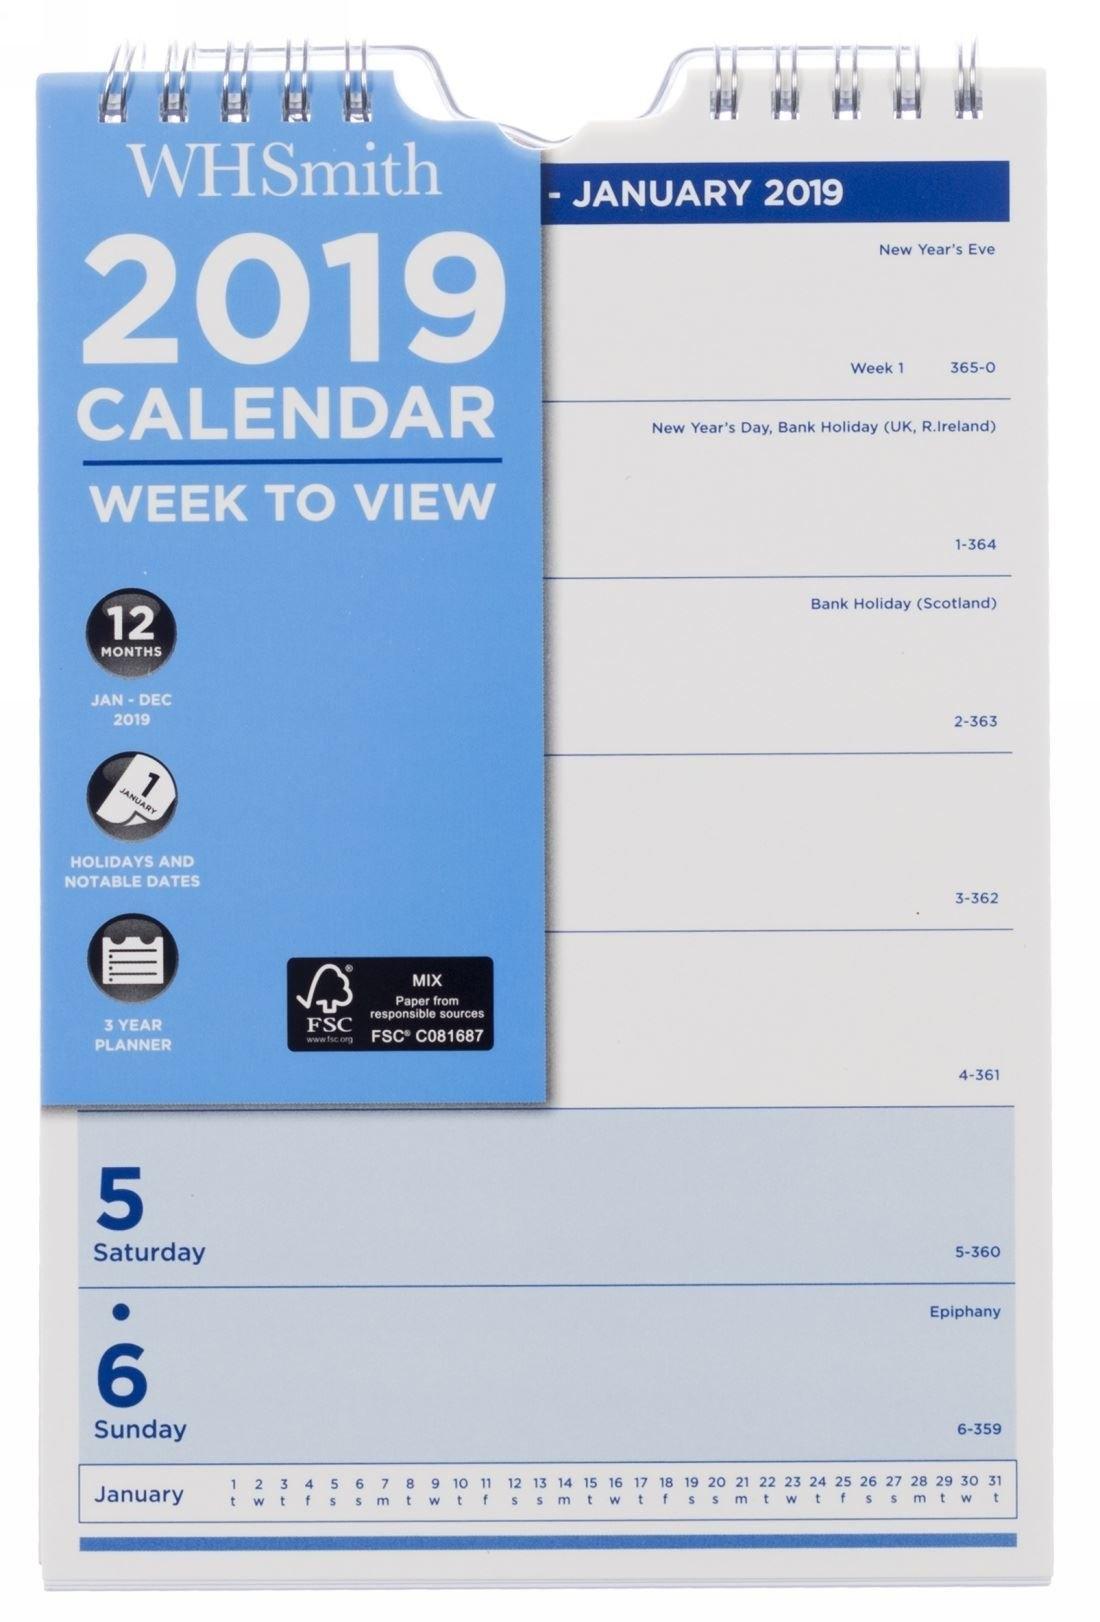 Whsmith Small Wall Calendar 2019 Week To View 220.0 X 140.0 X 10.0 W H Smith Calendar 2019